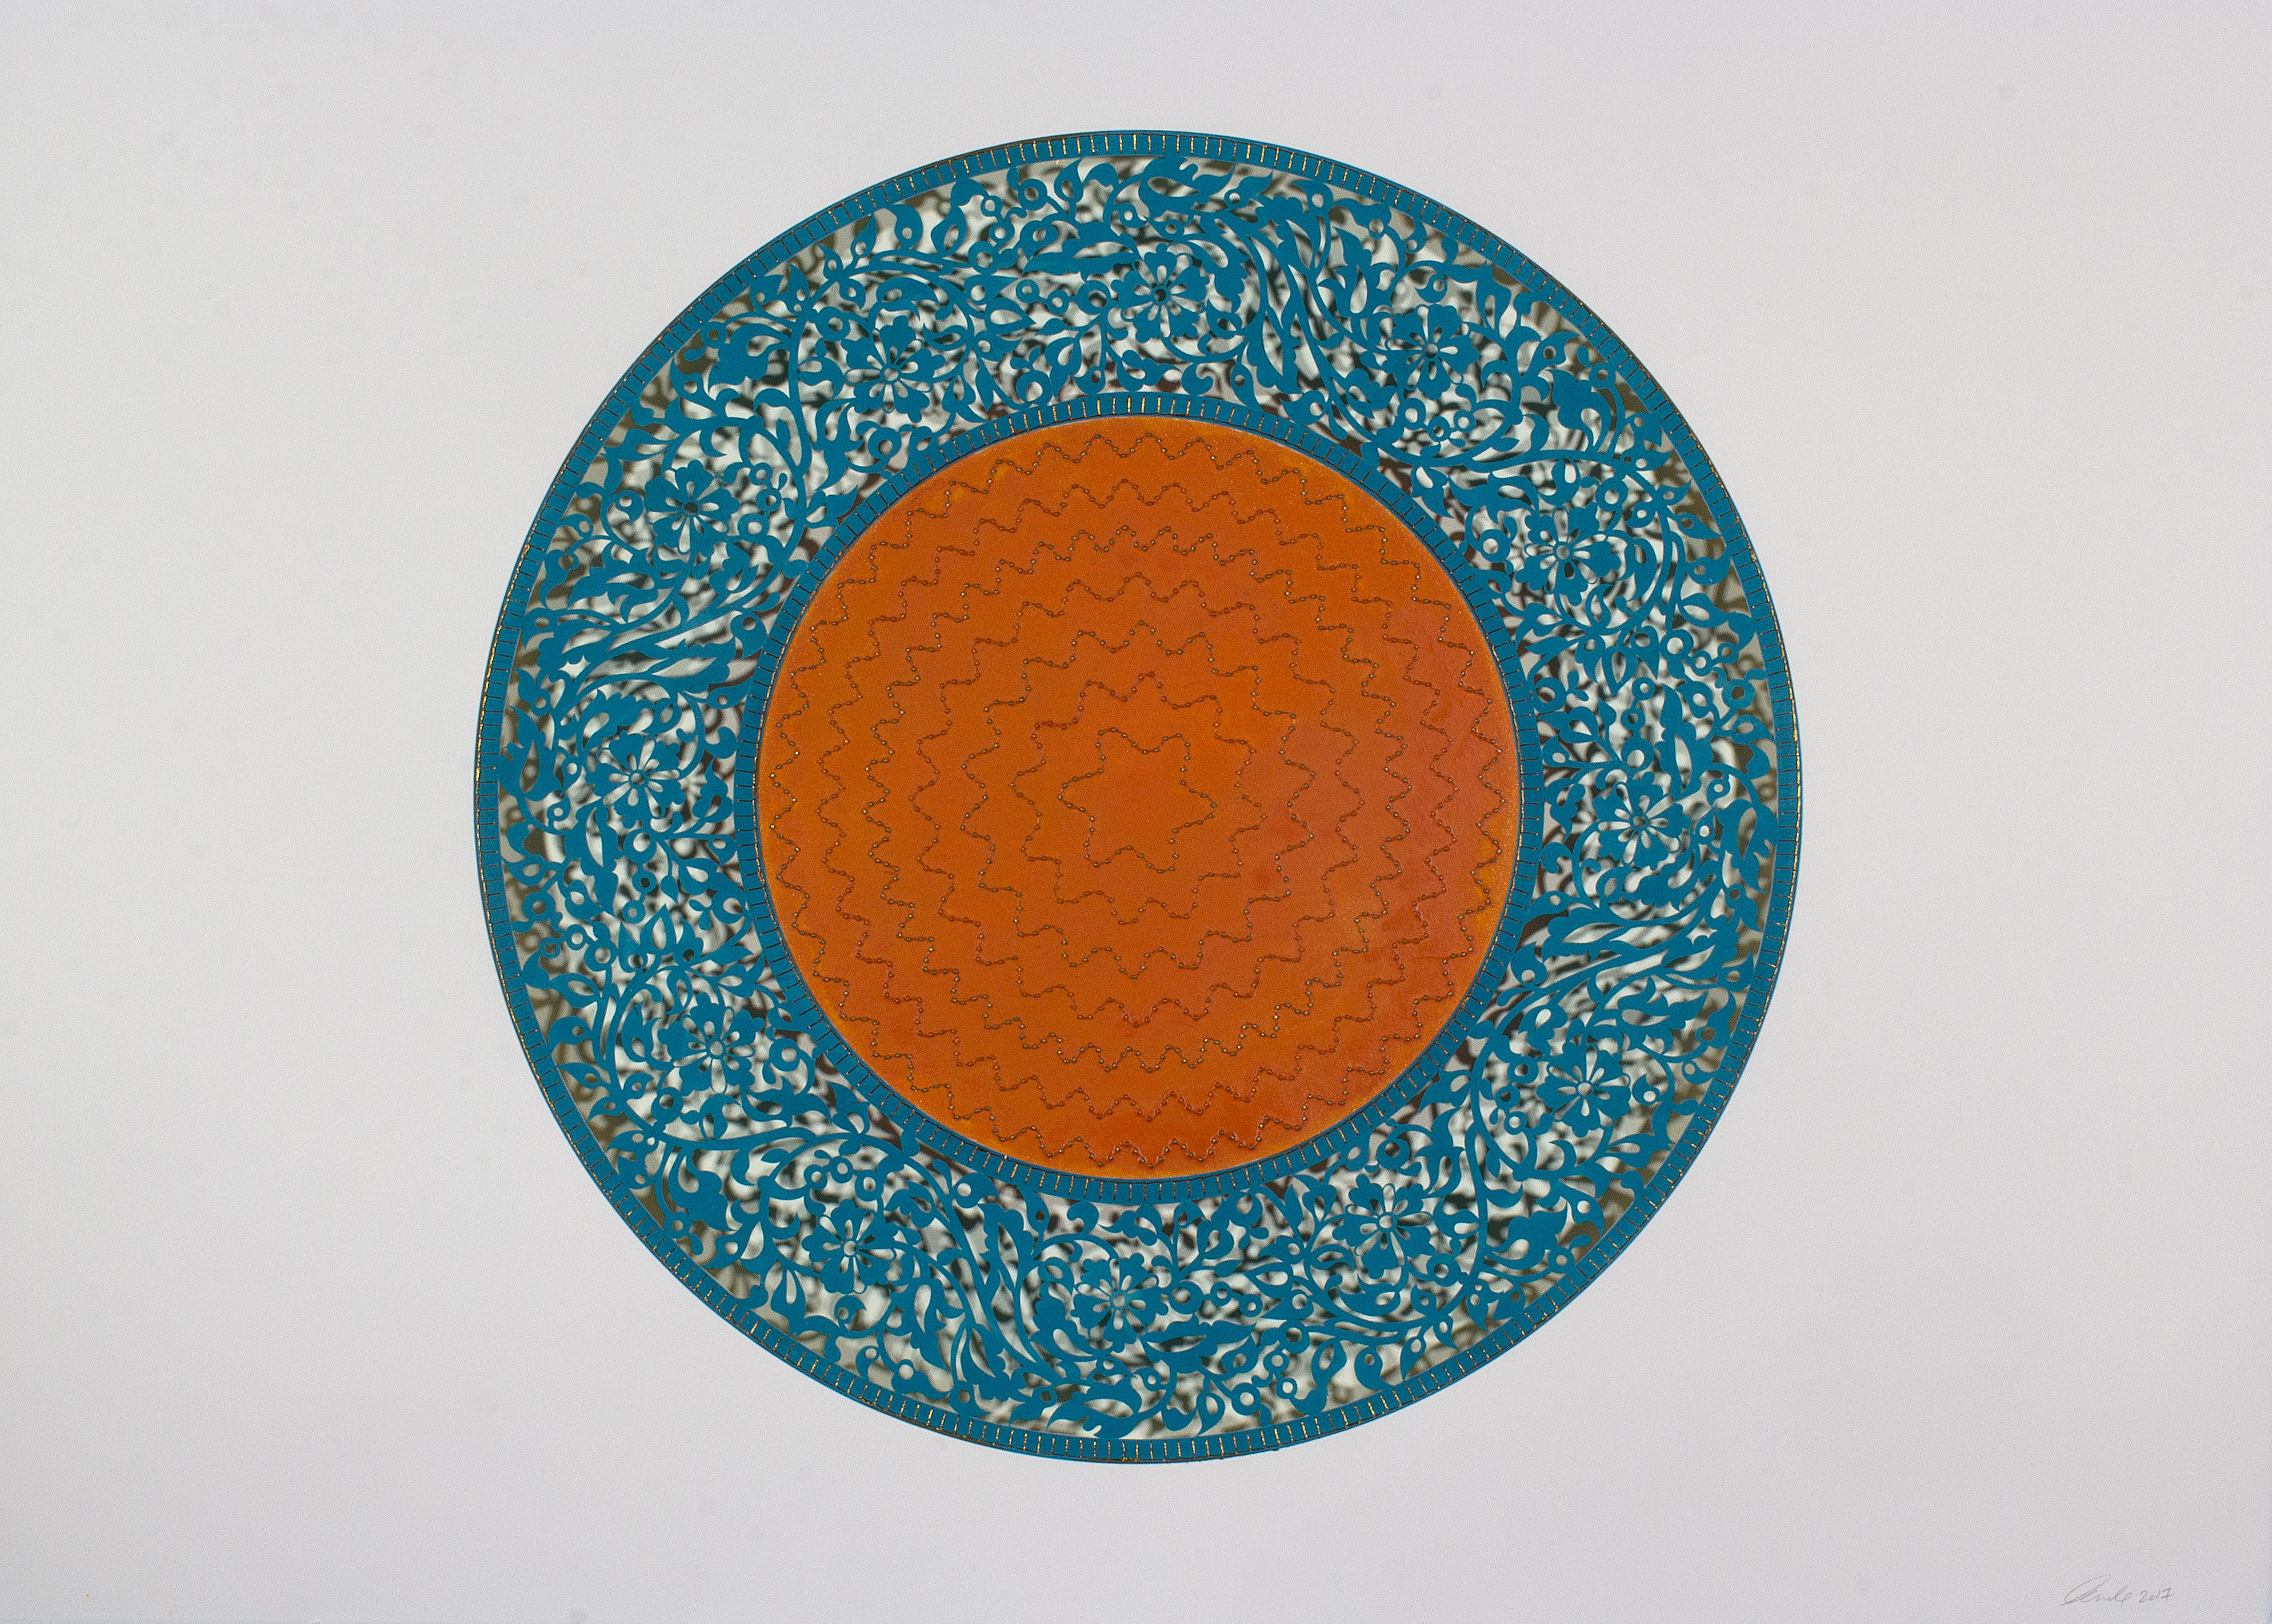 Flowers (Blue and Orange Circle)